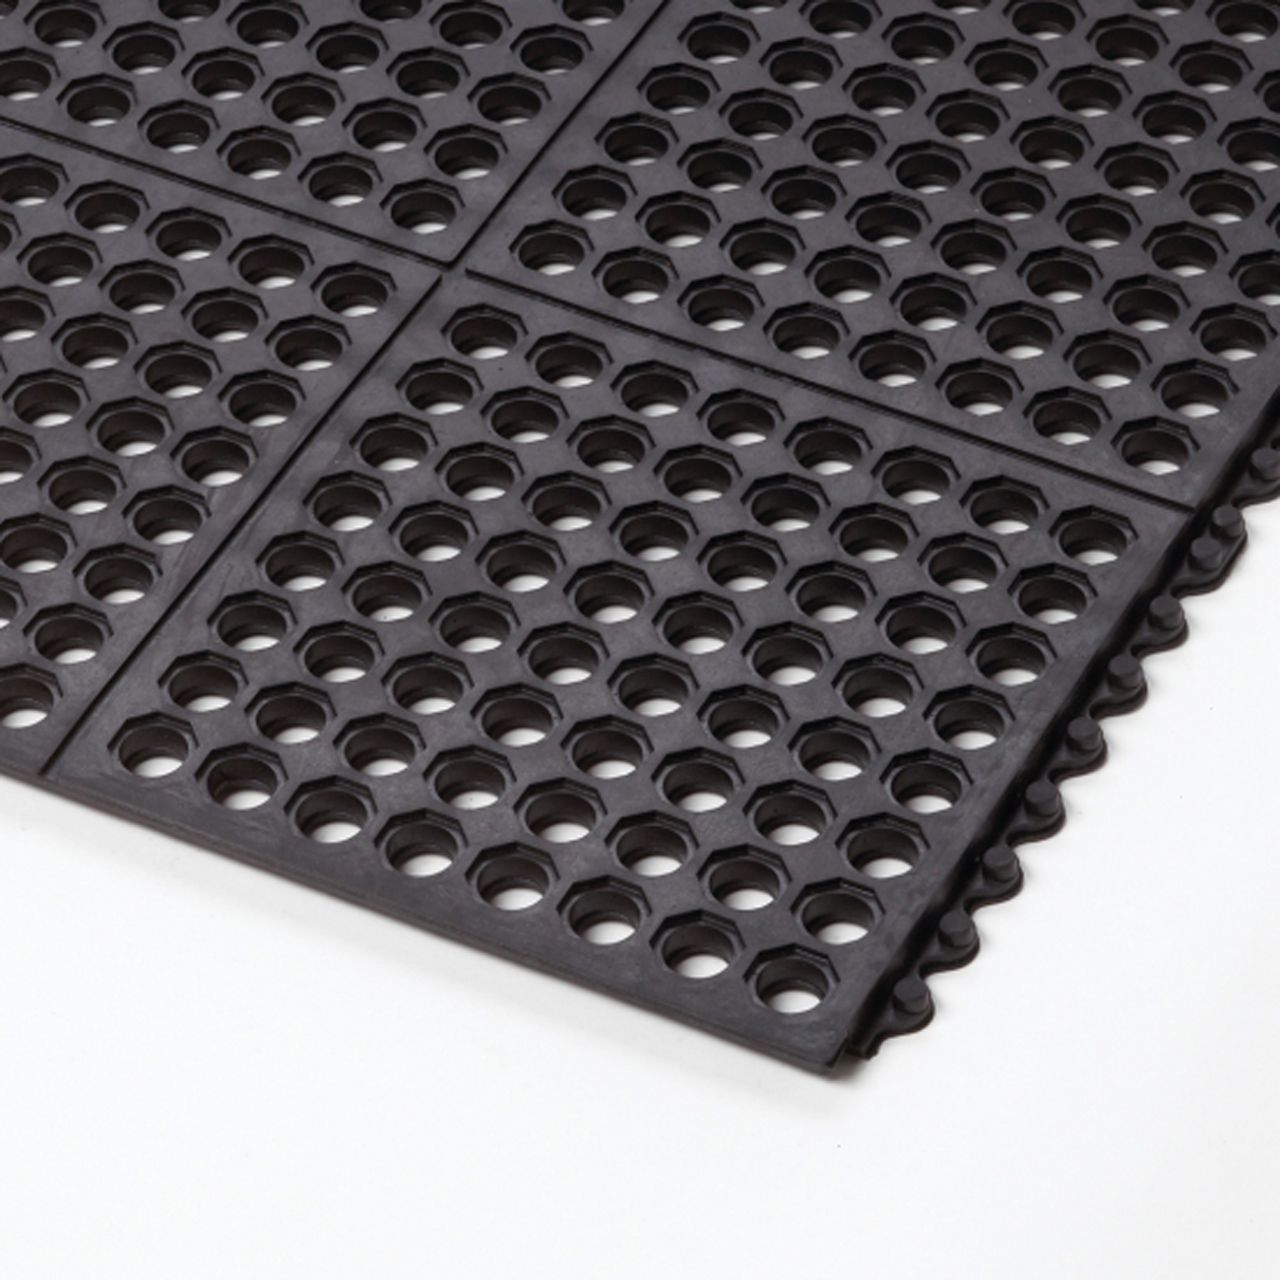 cushion ease anti vermoeidheidsmatten industriele hulpmiddelen 0006s Cushion Ease